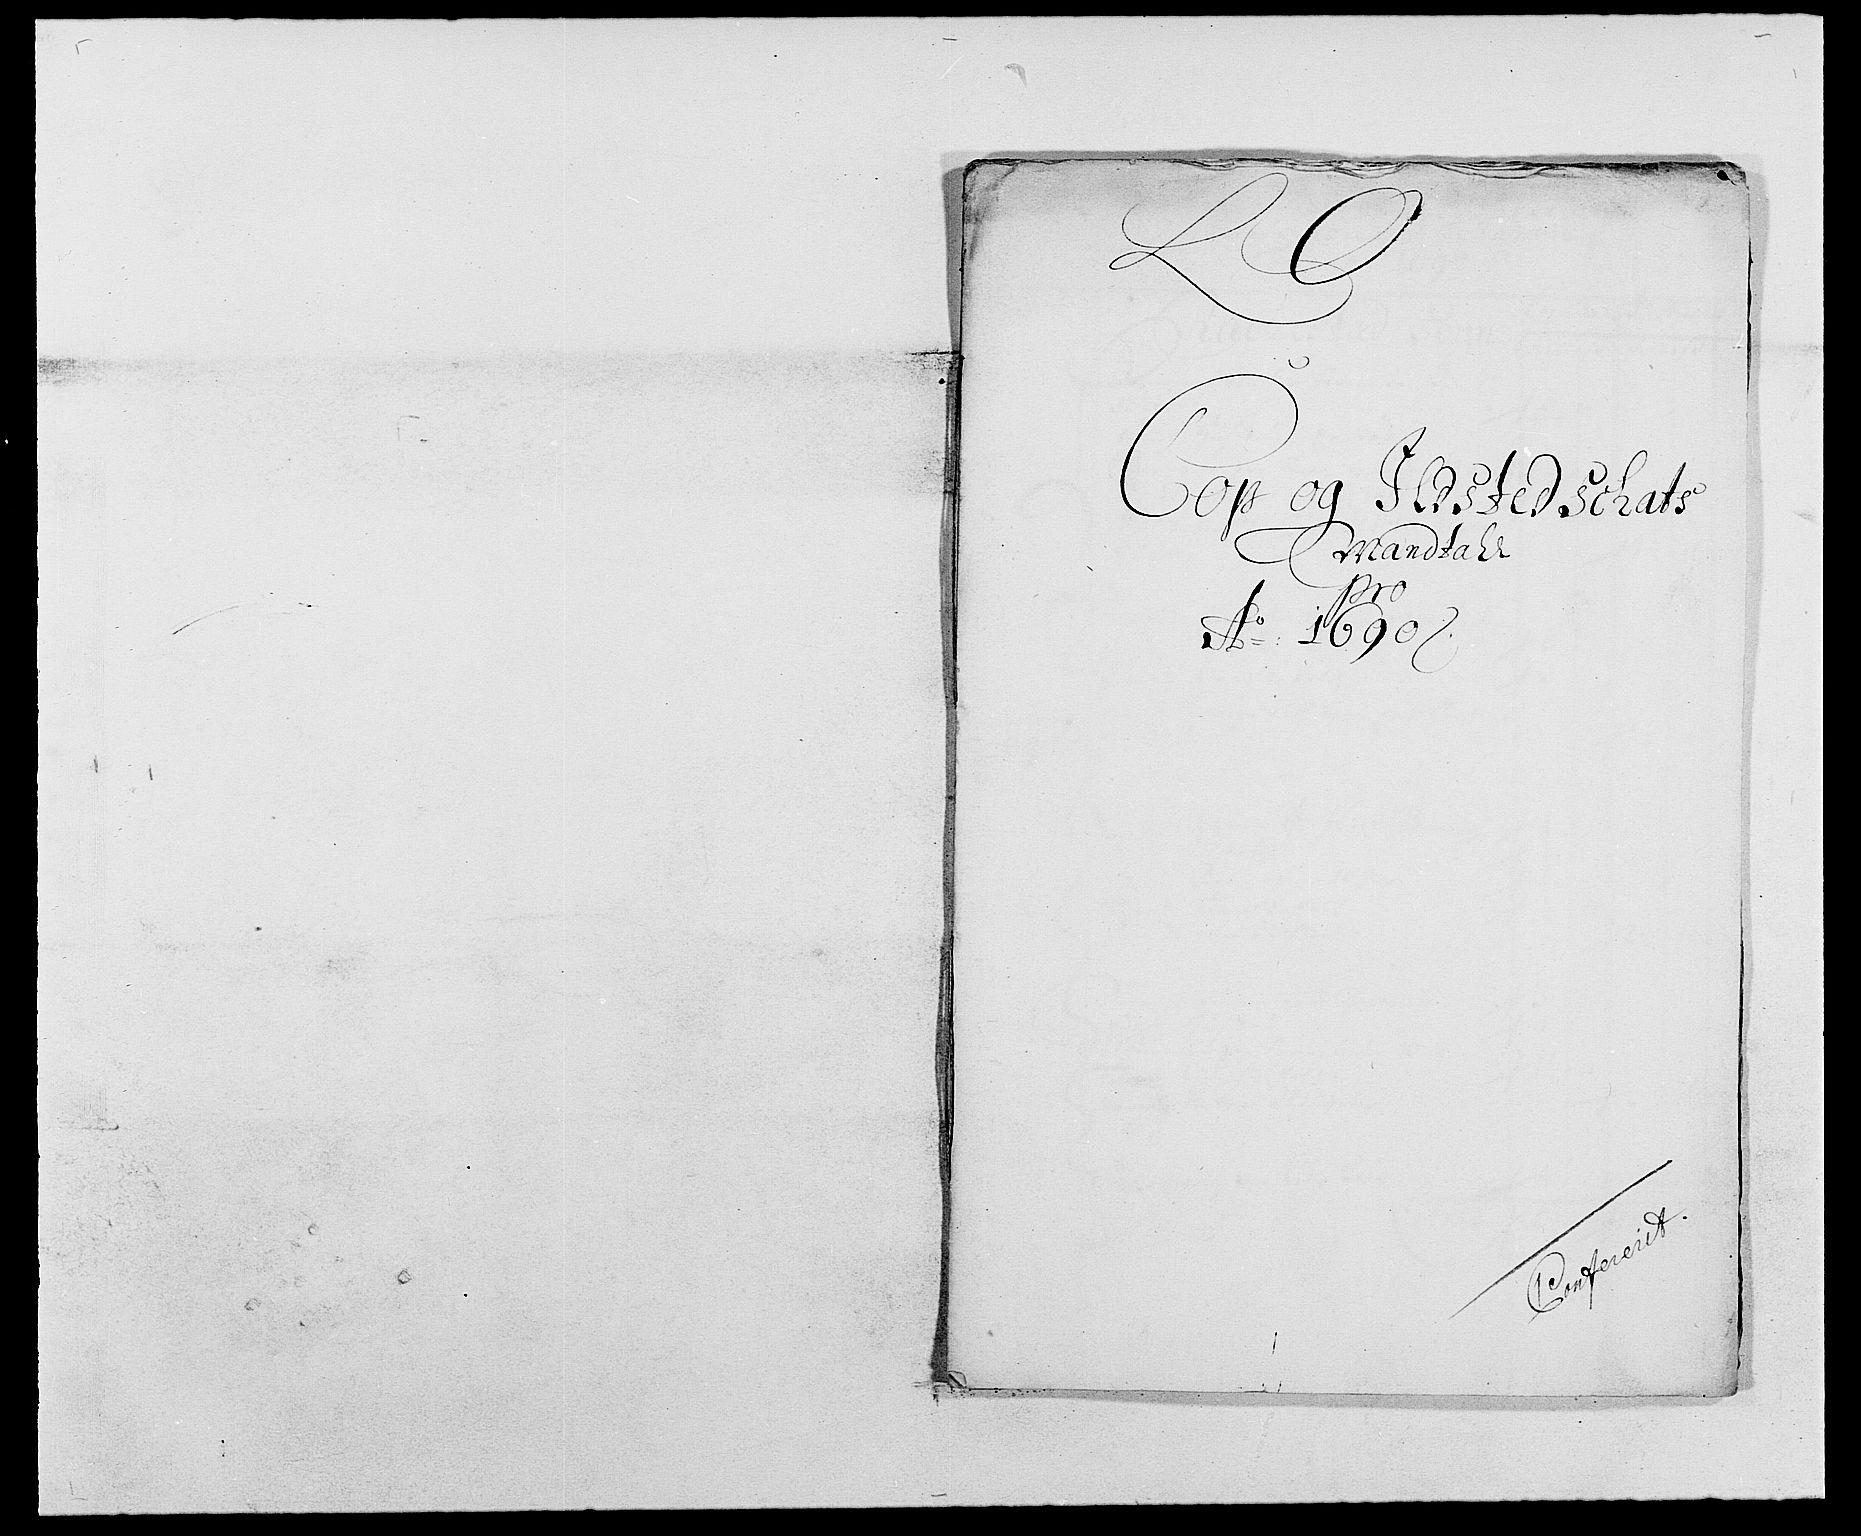 RA, Rentekammeret inntil 1814, Reviderte regnskaper, Fogderegnskap, R05/L0277: Fogderegnskap Rakkestad, 1689-1690, s. 282